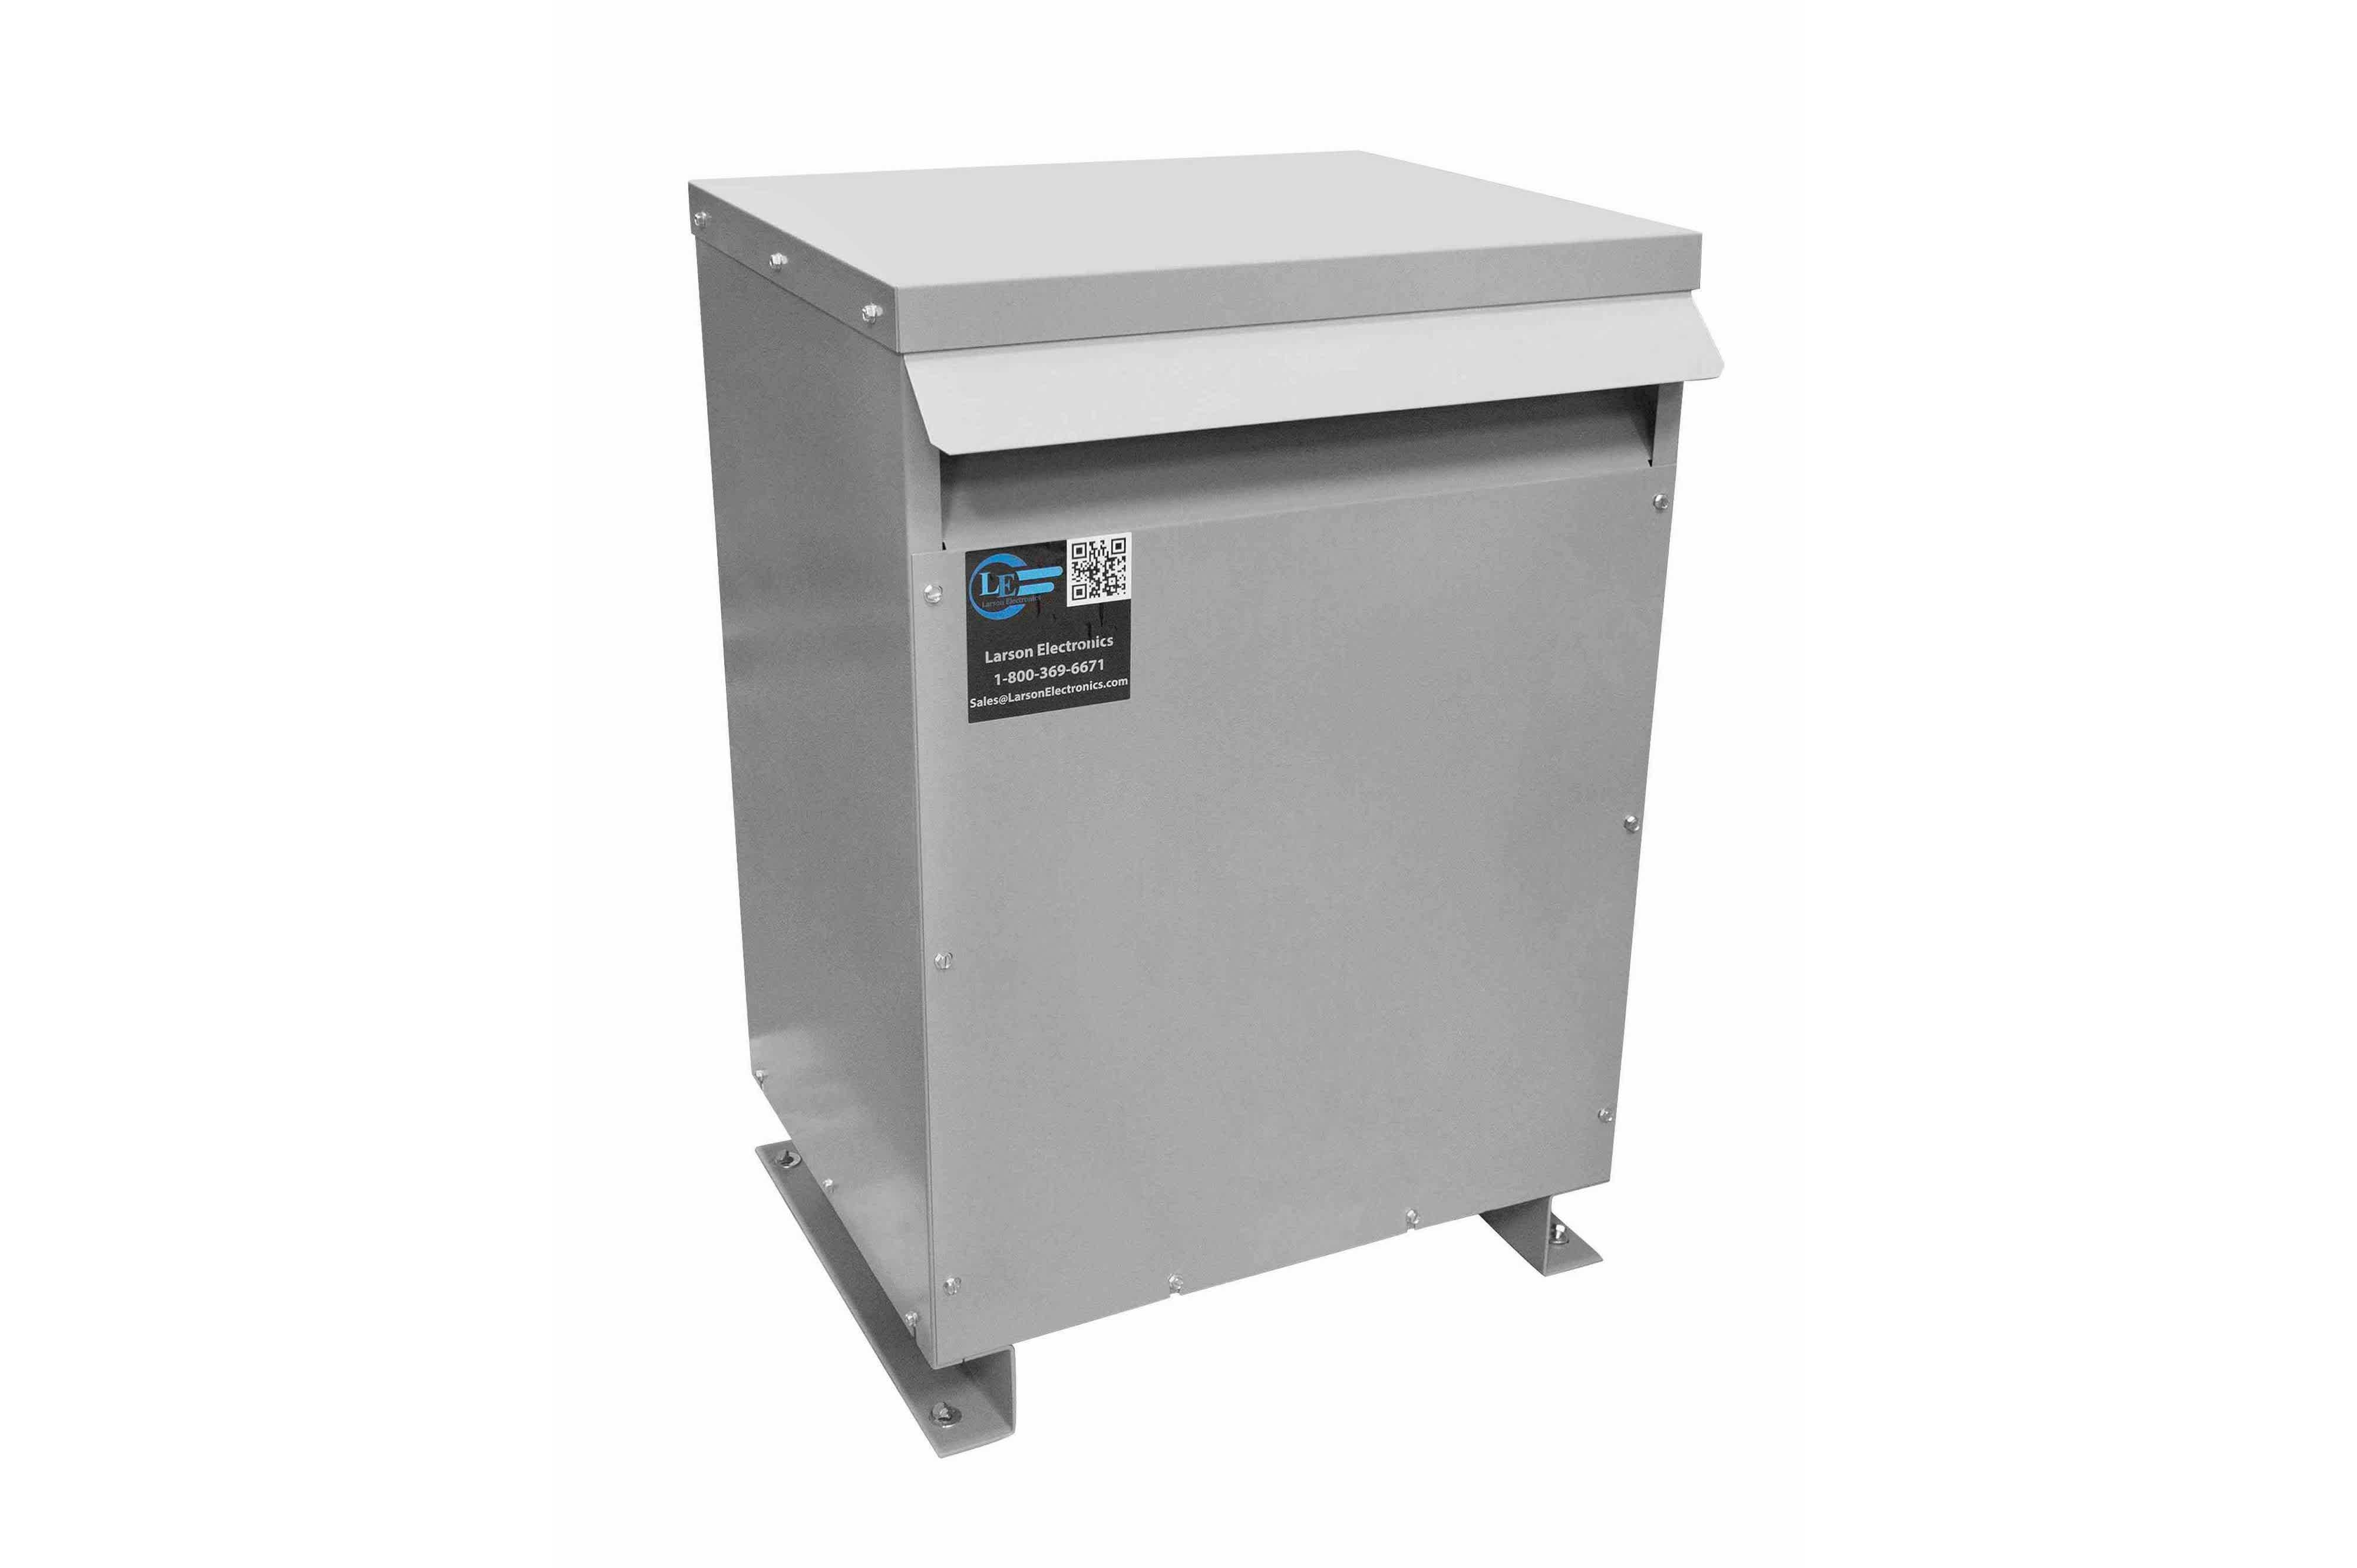 52.5 kVA 3PH Isolation Transformer, 575V Wye Primary, 480Y/277 Wye-N Secondary, N3R, Ventilated, 60 Hz